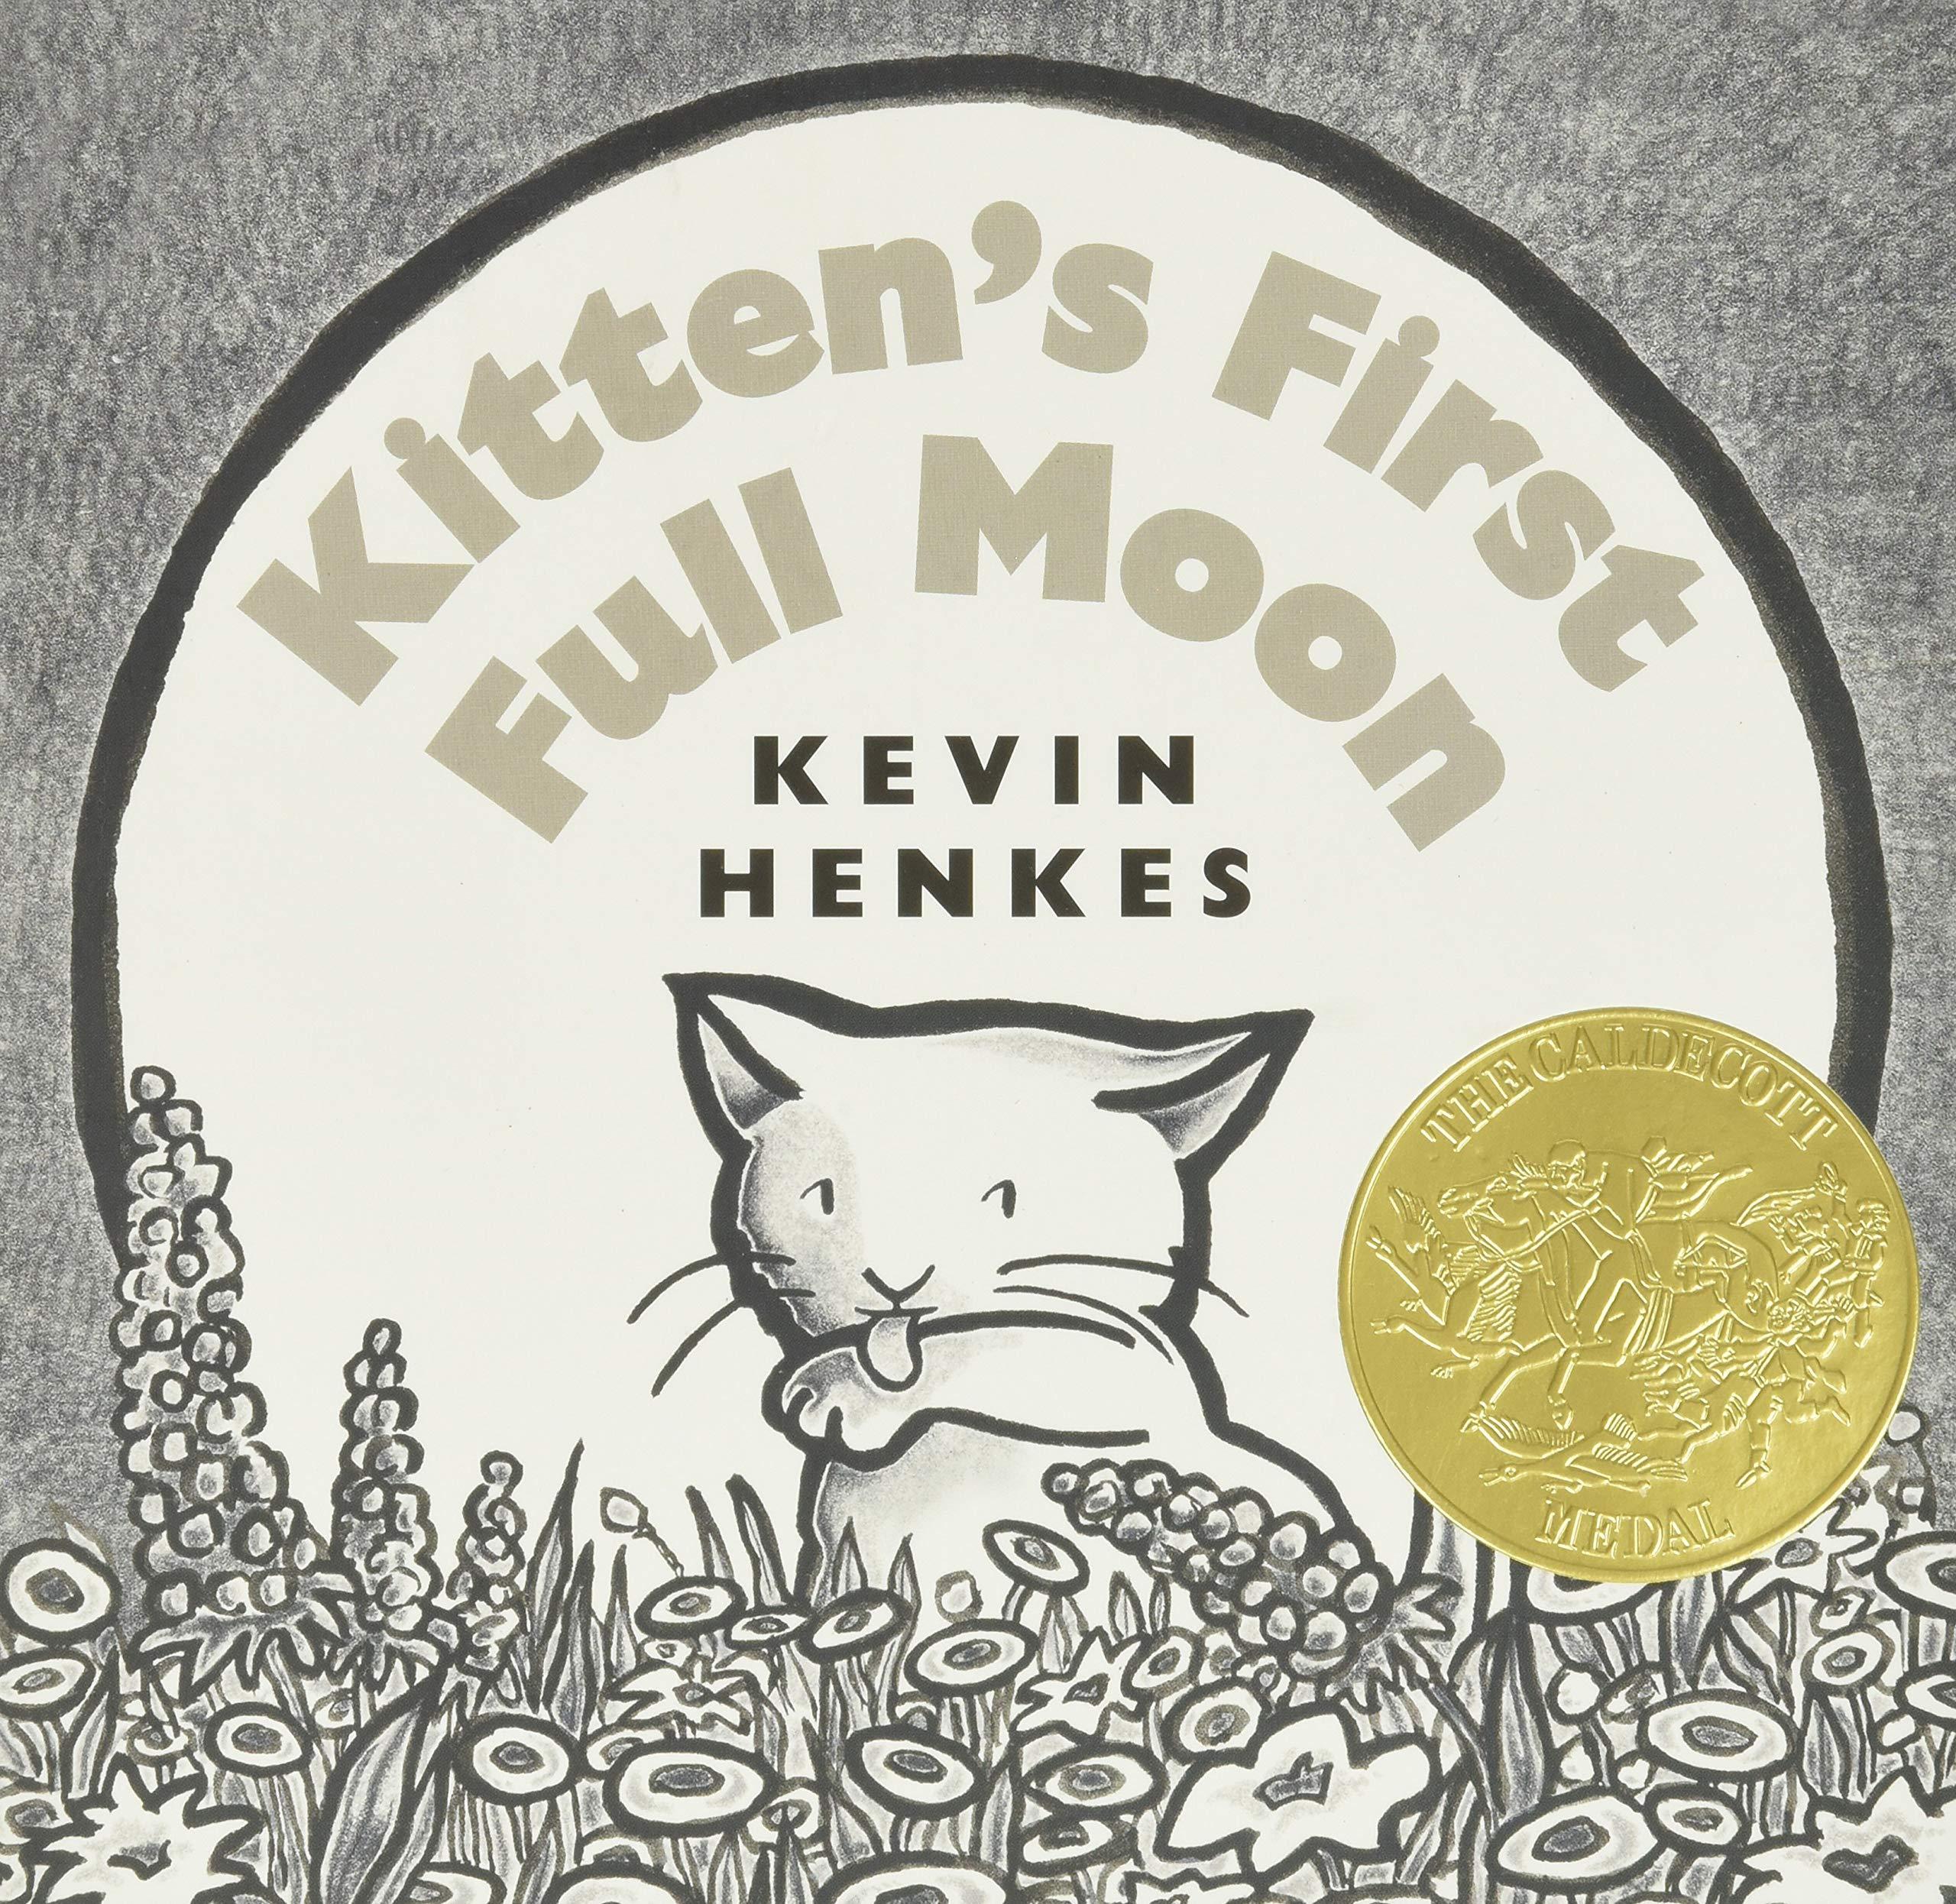 Kitten's First Full Moon by Kevin Henkes - Board book for children